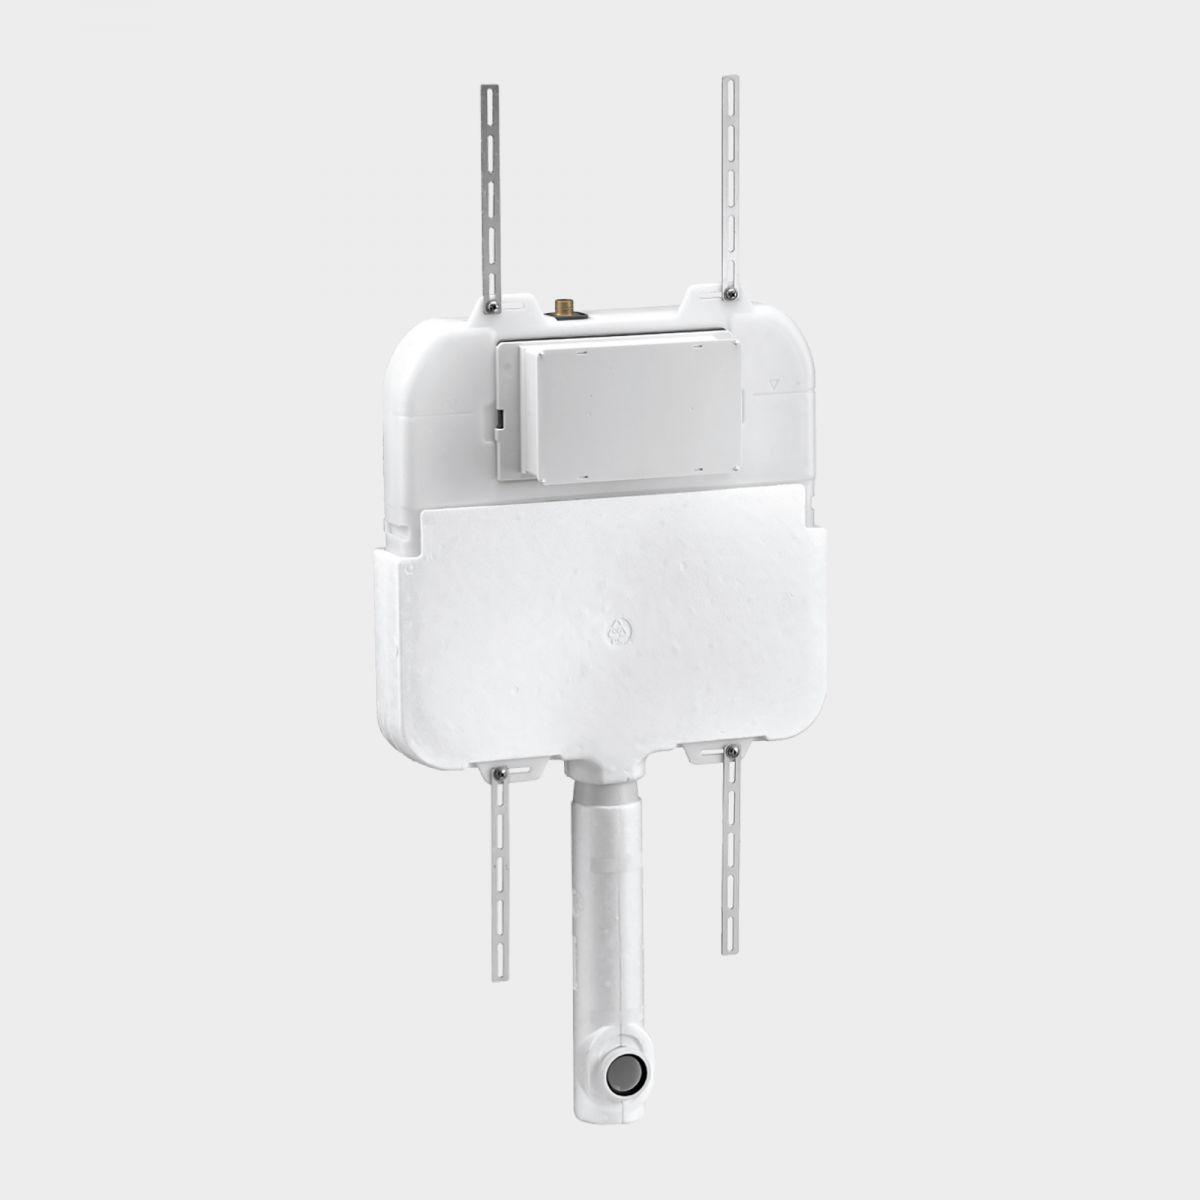 3D1.1005 In-Wall Cistern